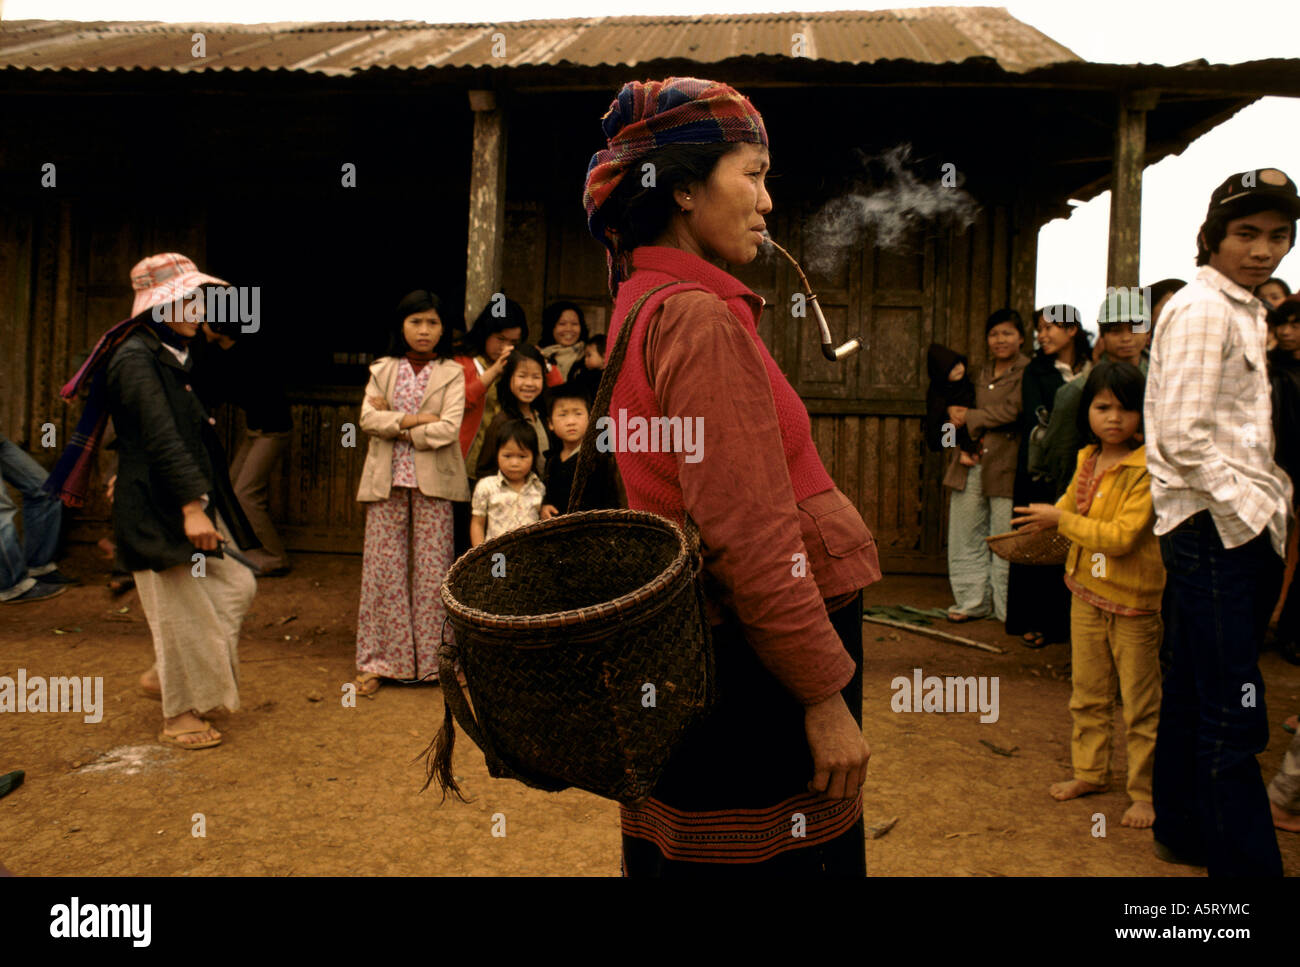 VIETNAM, TRIBAL MONTAGNARD WOMEN IN TRADITIONAL DRESS Stock Photo